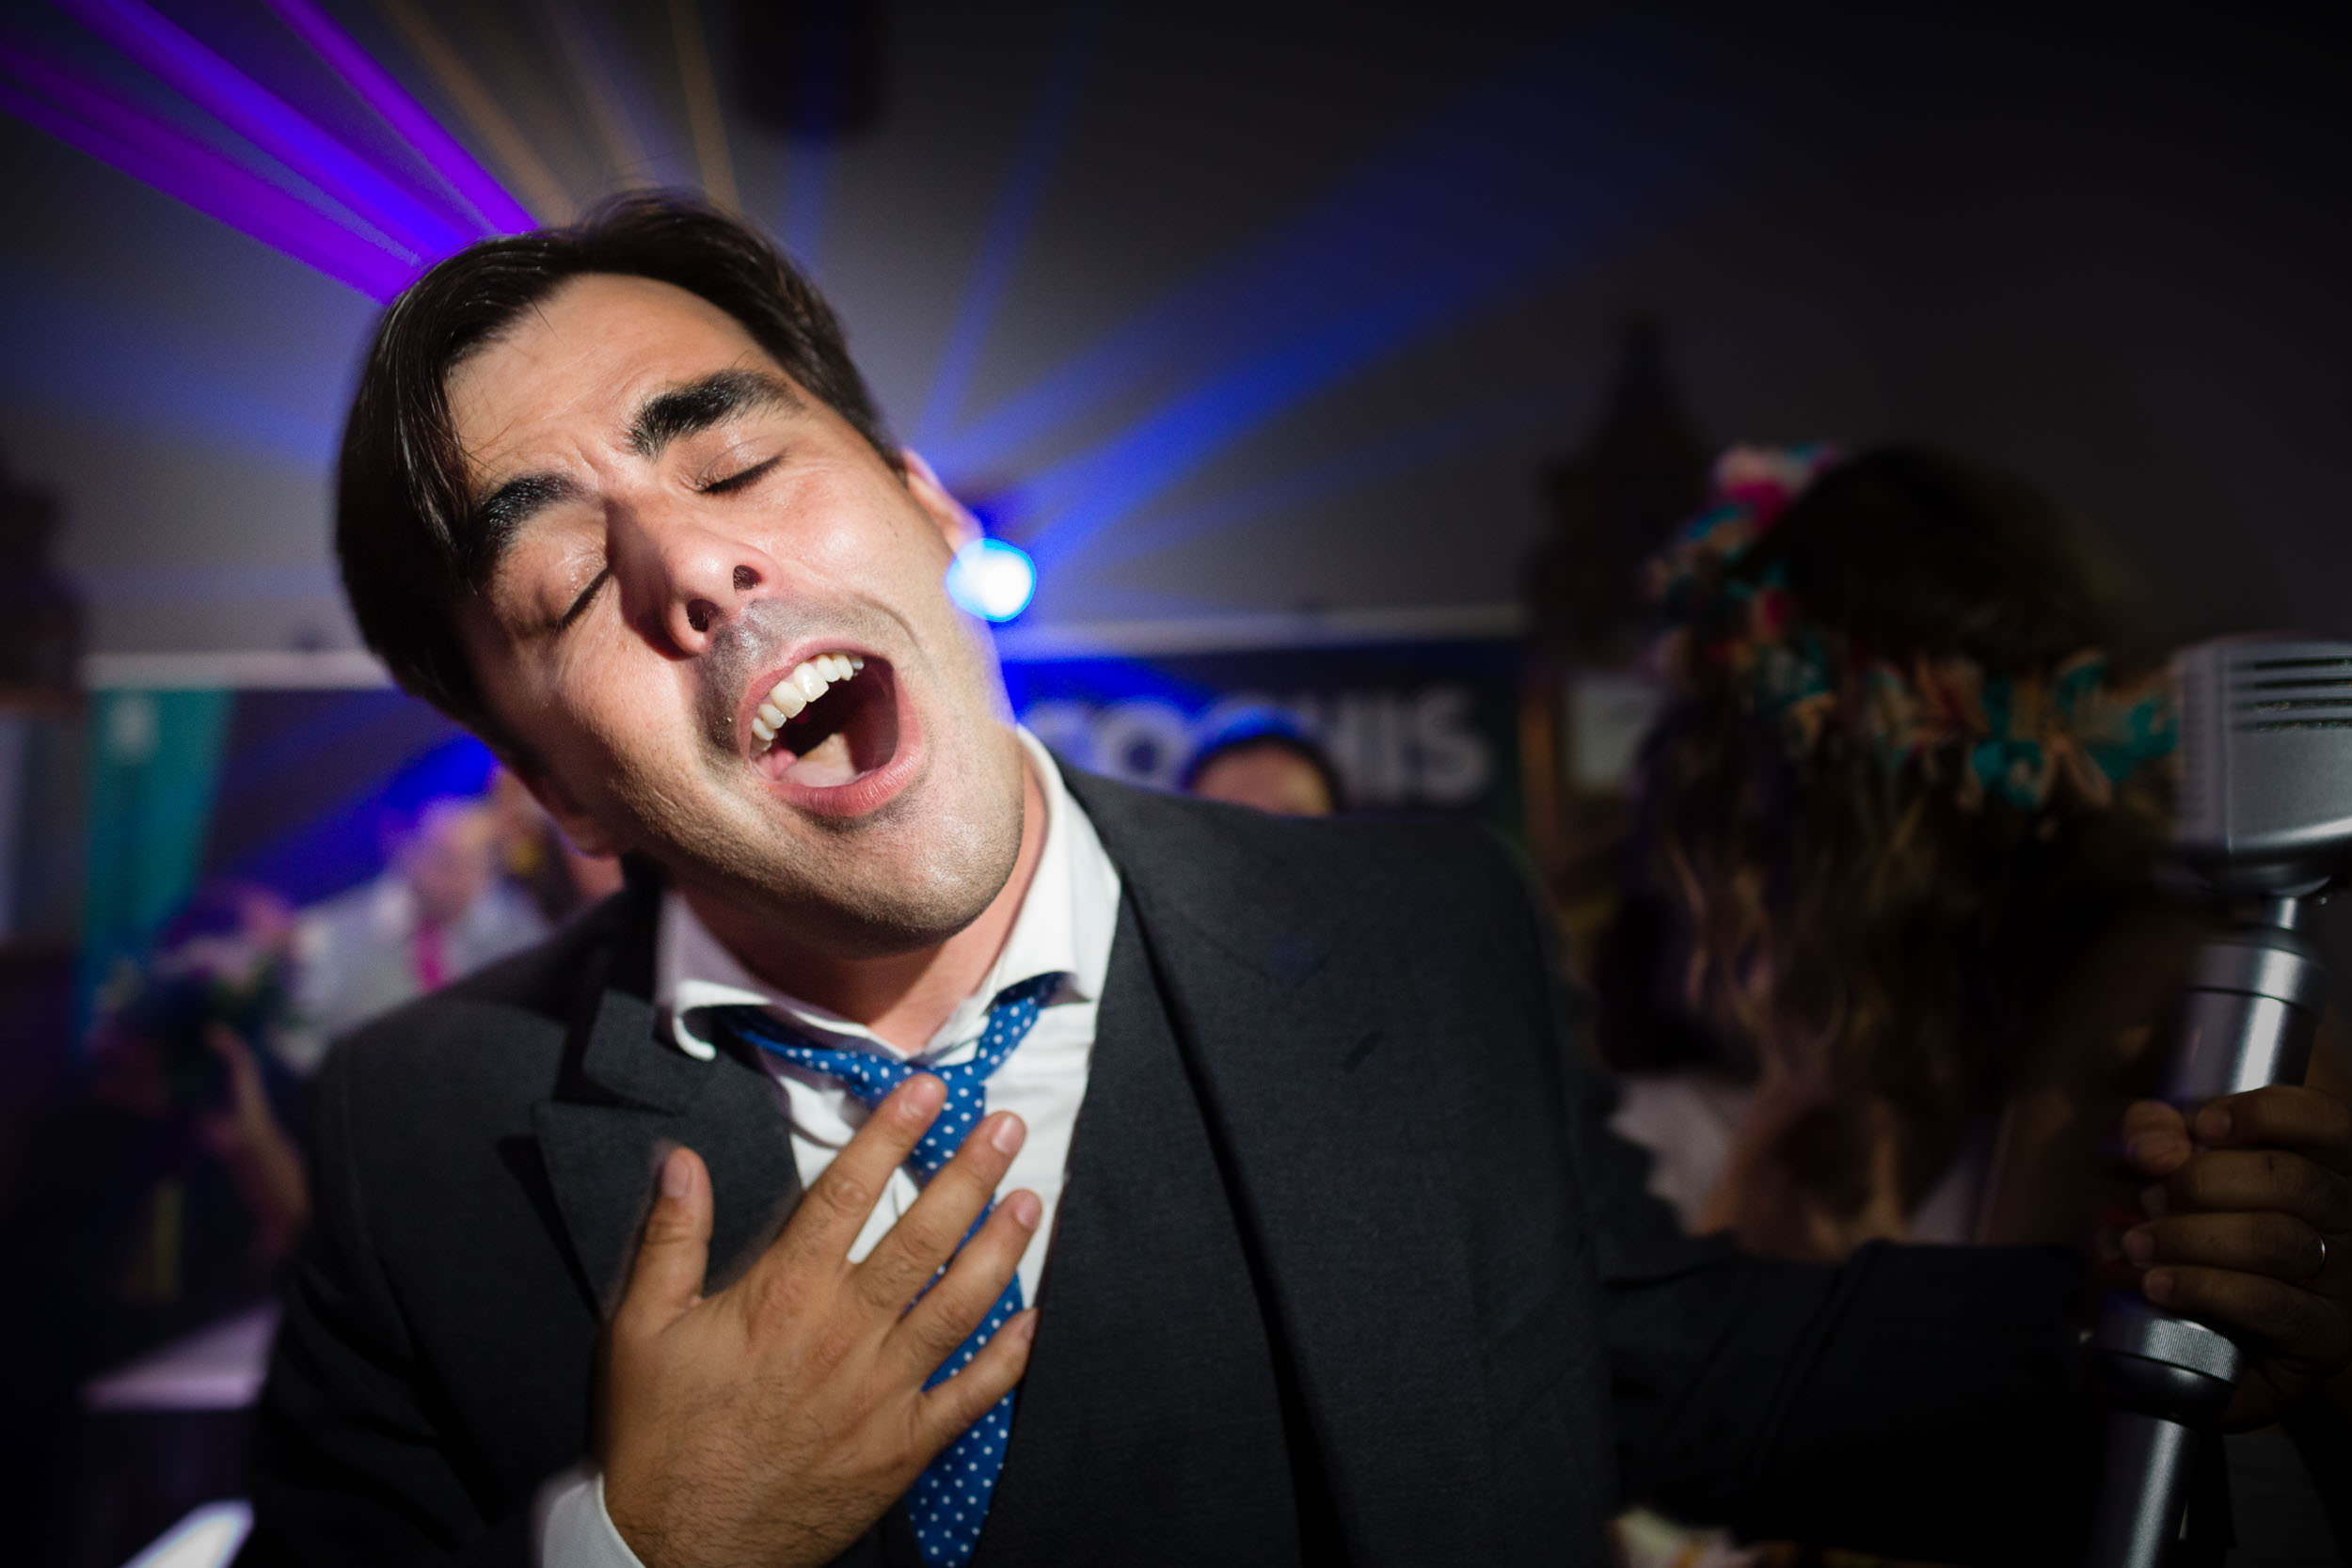 Wedding Photographer La Rioja Basque Country Spain - James Sturcke - sturcke.org_059.jpg